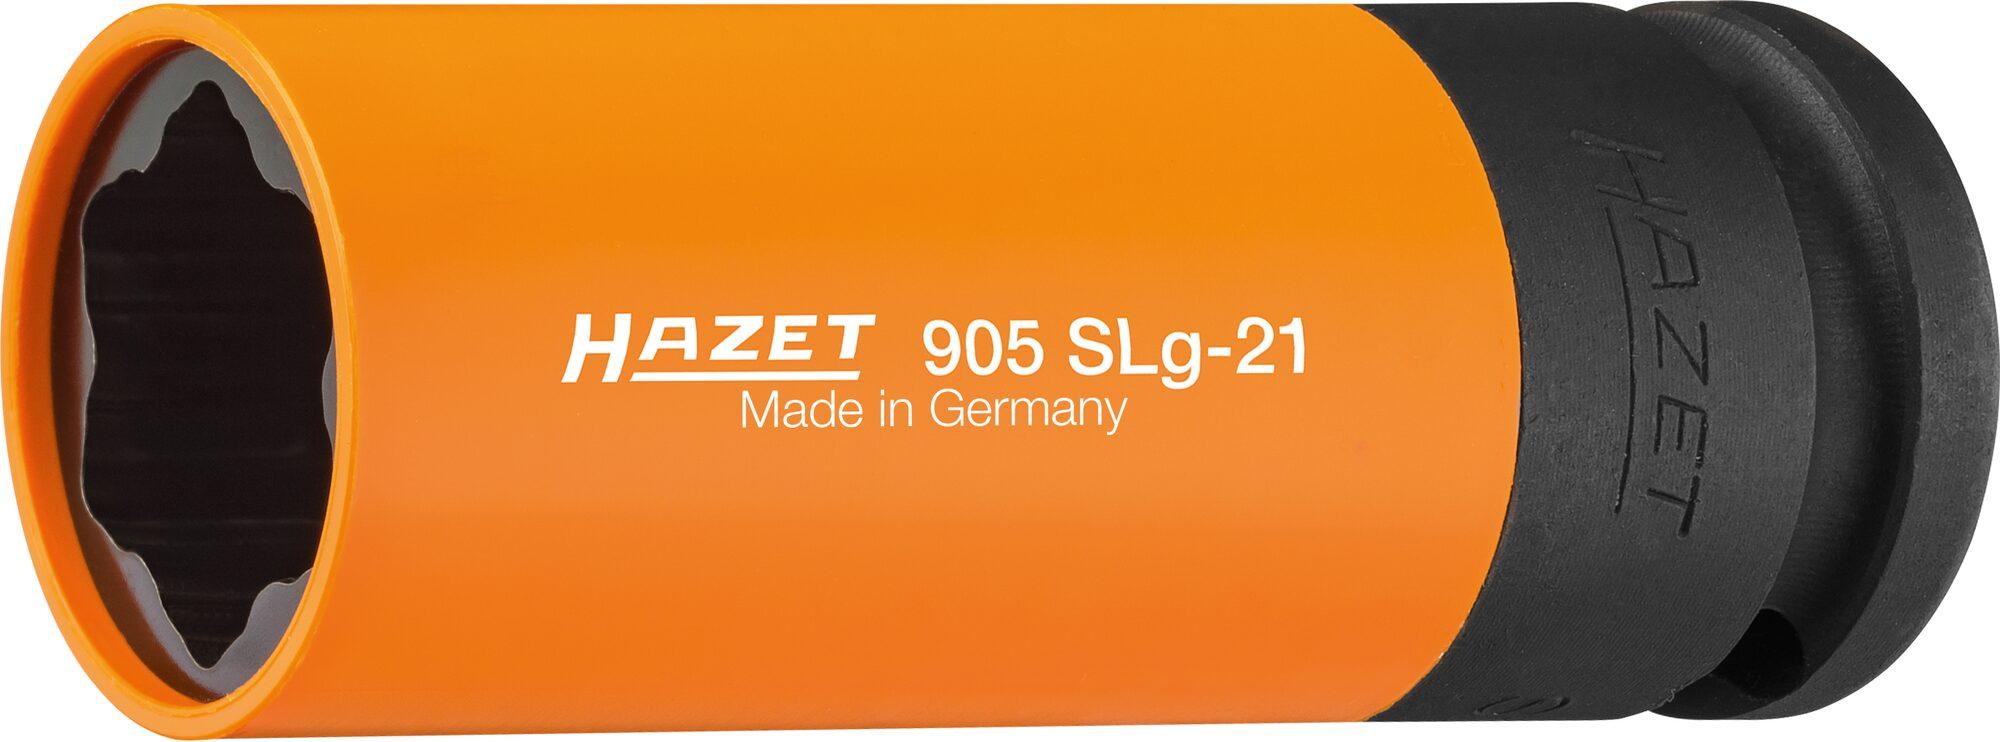 HAZET Schlag-, Maschinenschrauber Steckschlüsseleinsatz ∙ Sonderprofil 905SLG-21 ∙ Vierkant hohl 12,5 mm (1/2 Zoll)